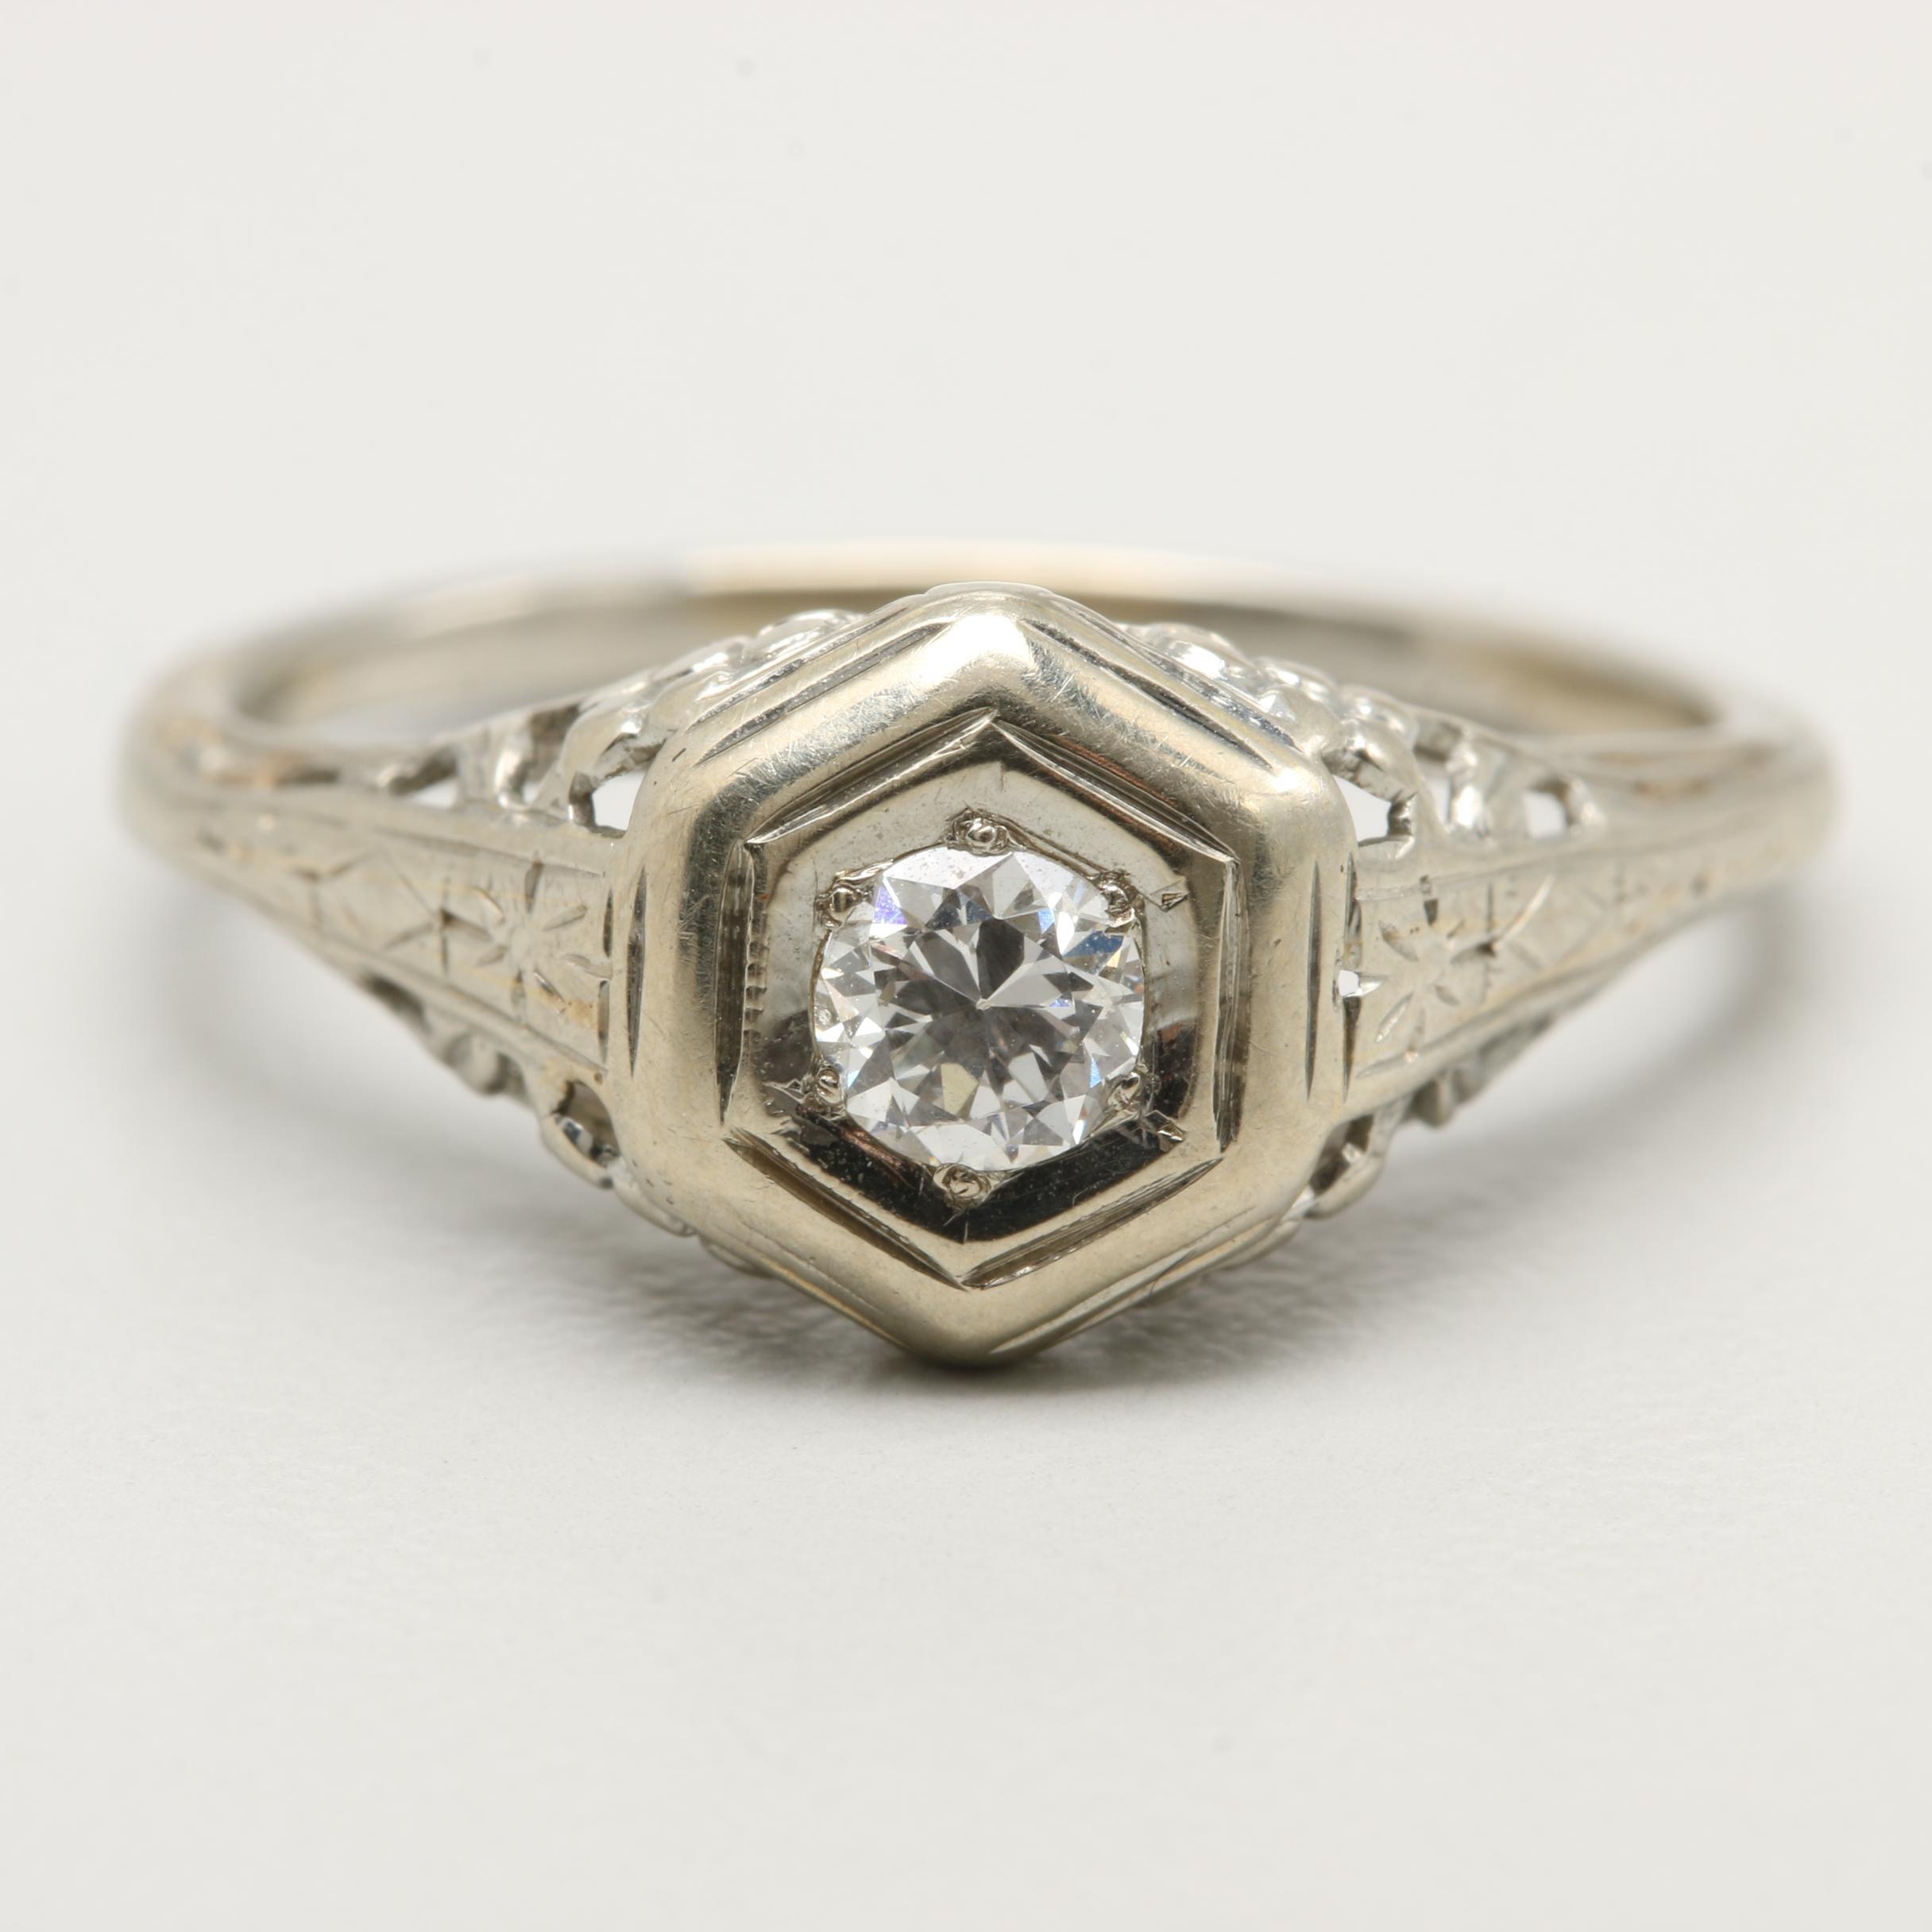 Circa 1920s - 1930s 10K White Gold Diamond Ring